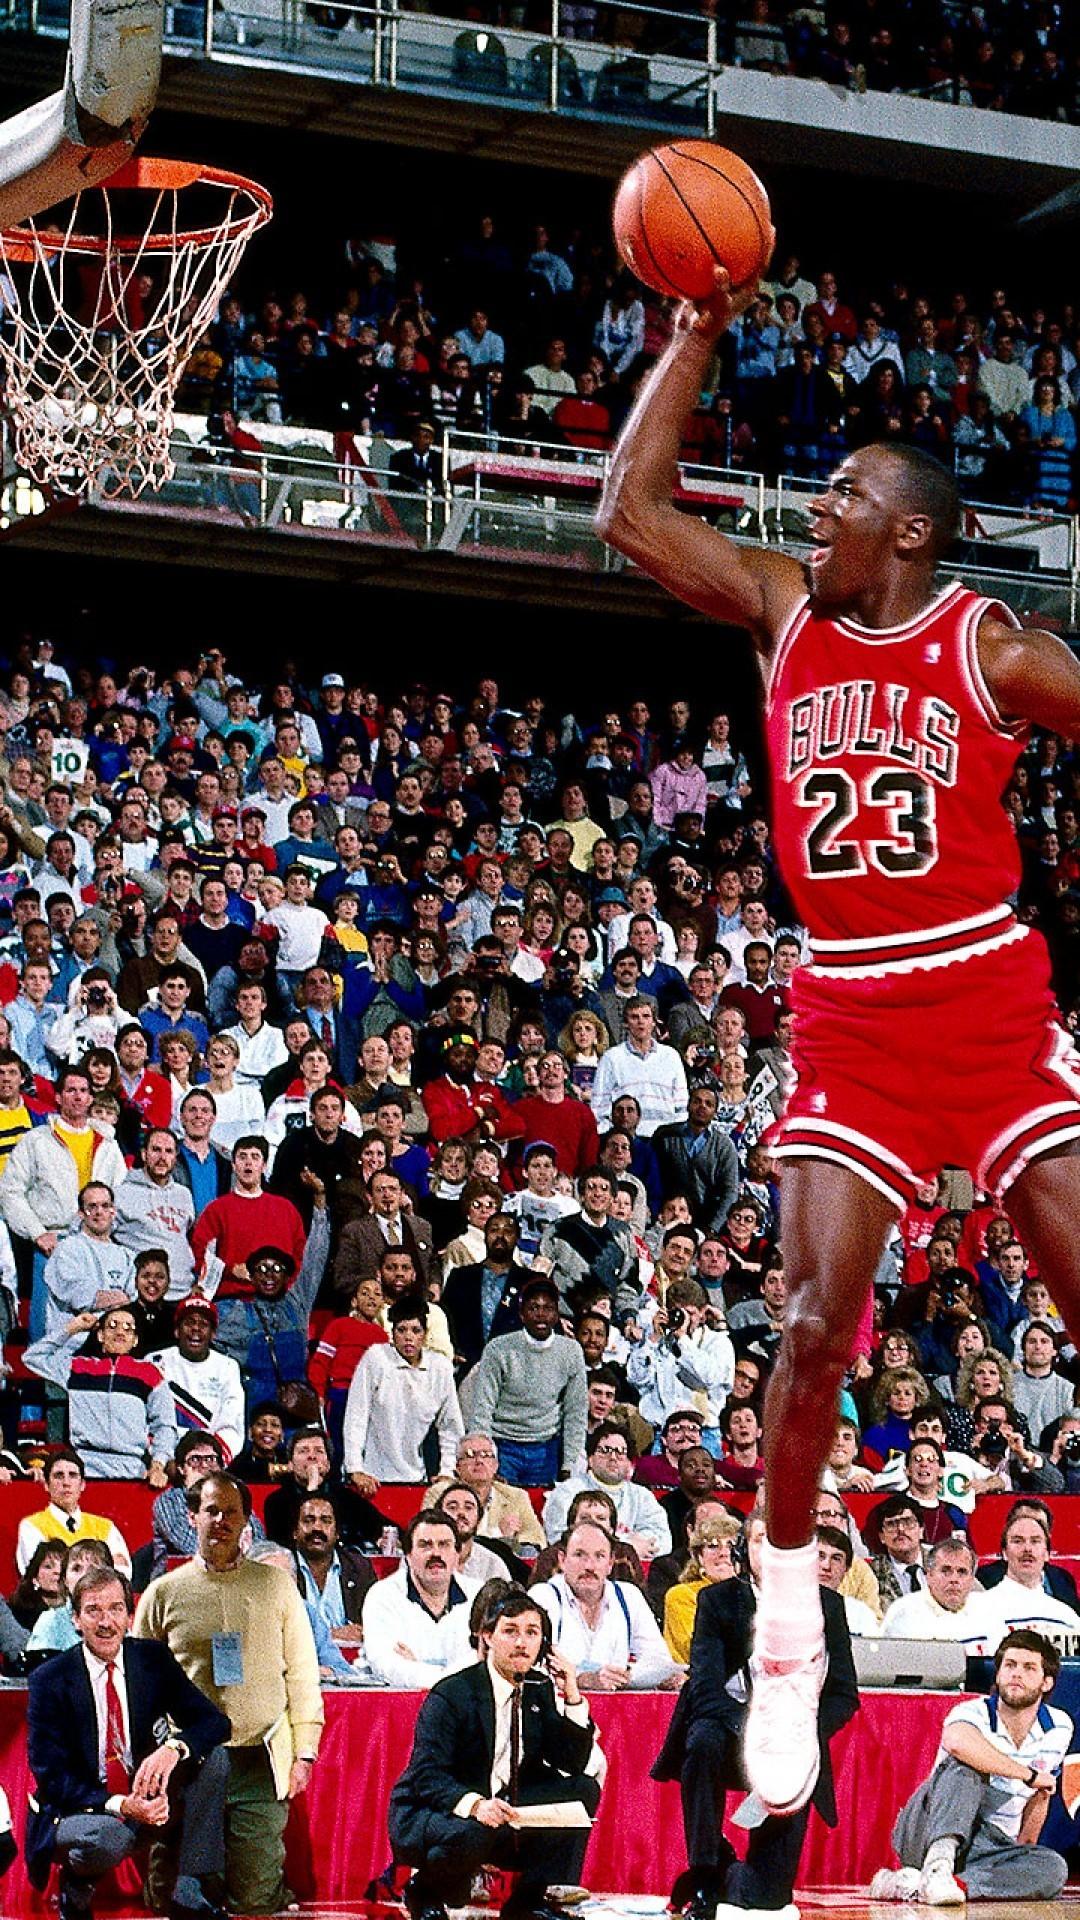 Chicago Wallpaper Iphone X Michael Jordan Hd Wallpaper 71 Images